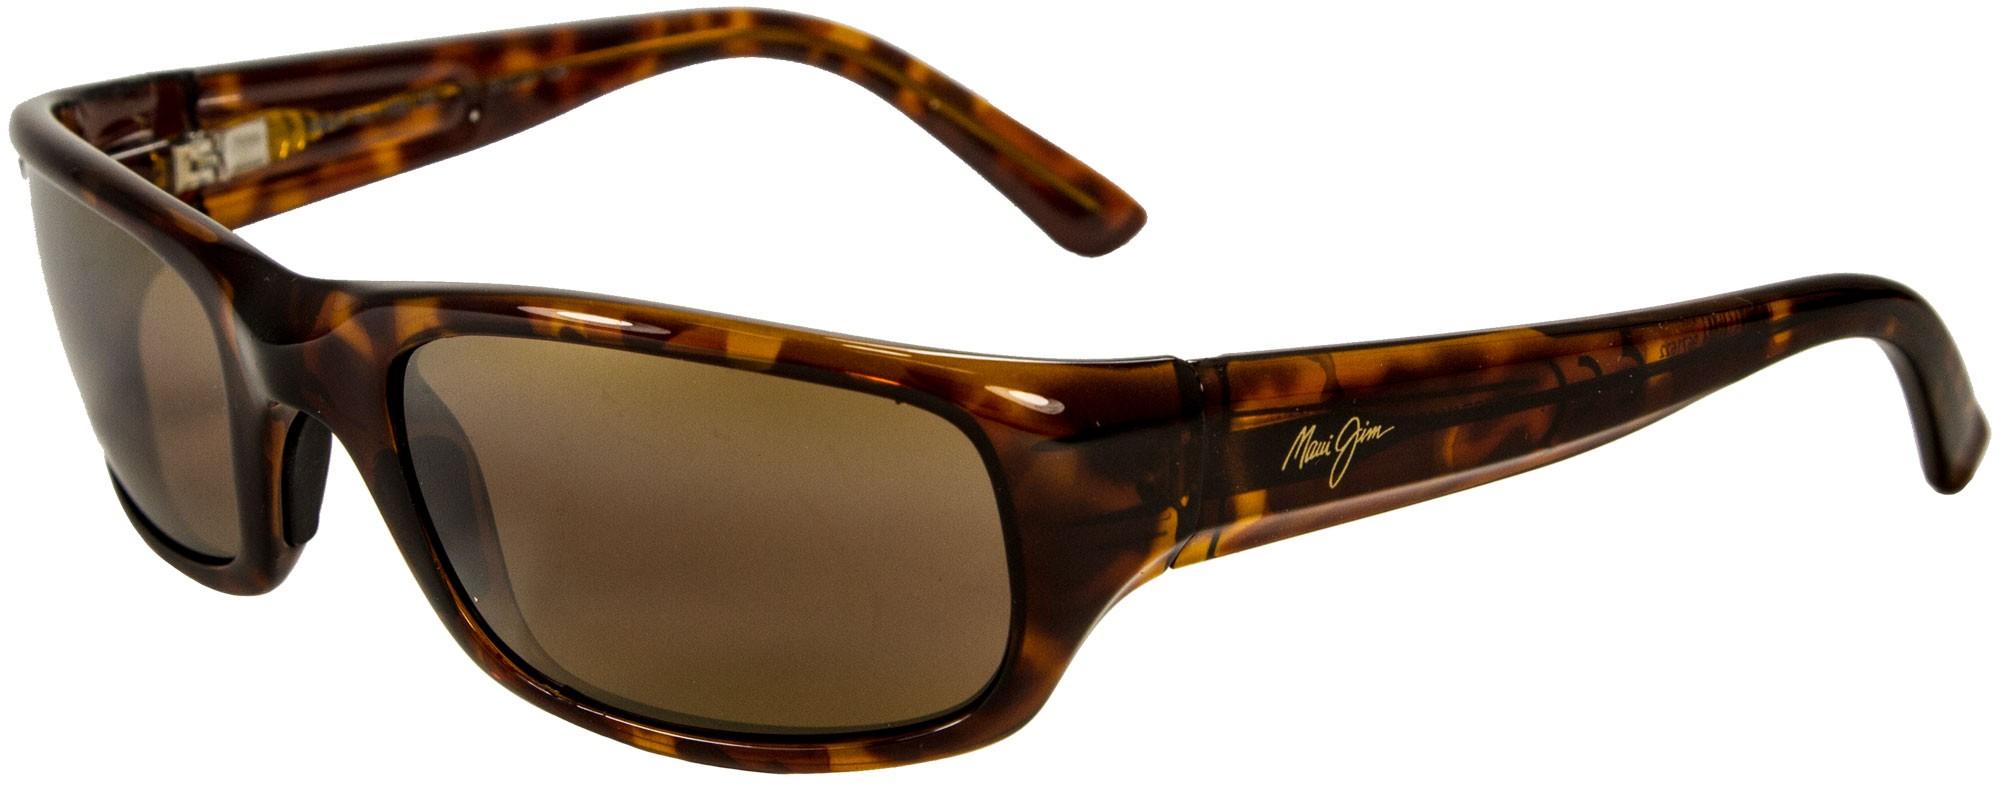 Maui Jim Stingray H103-10 2